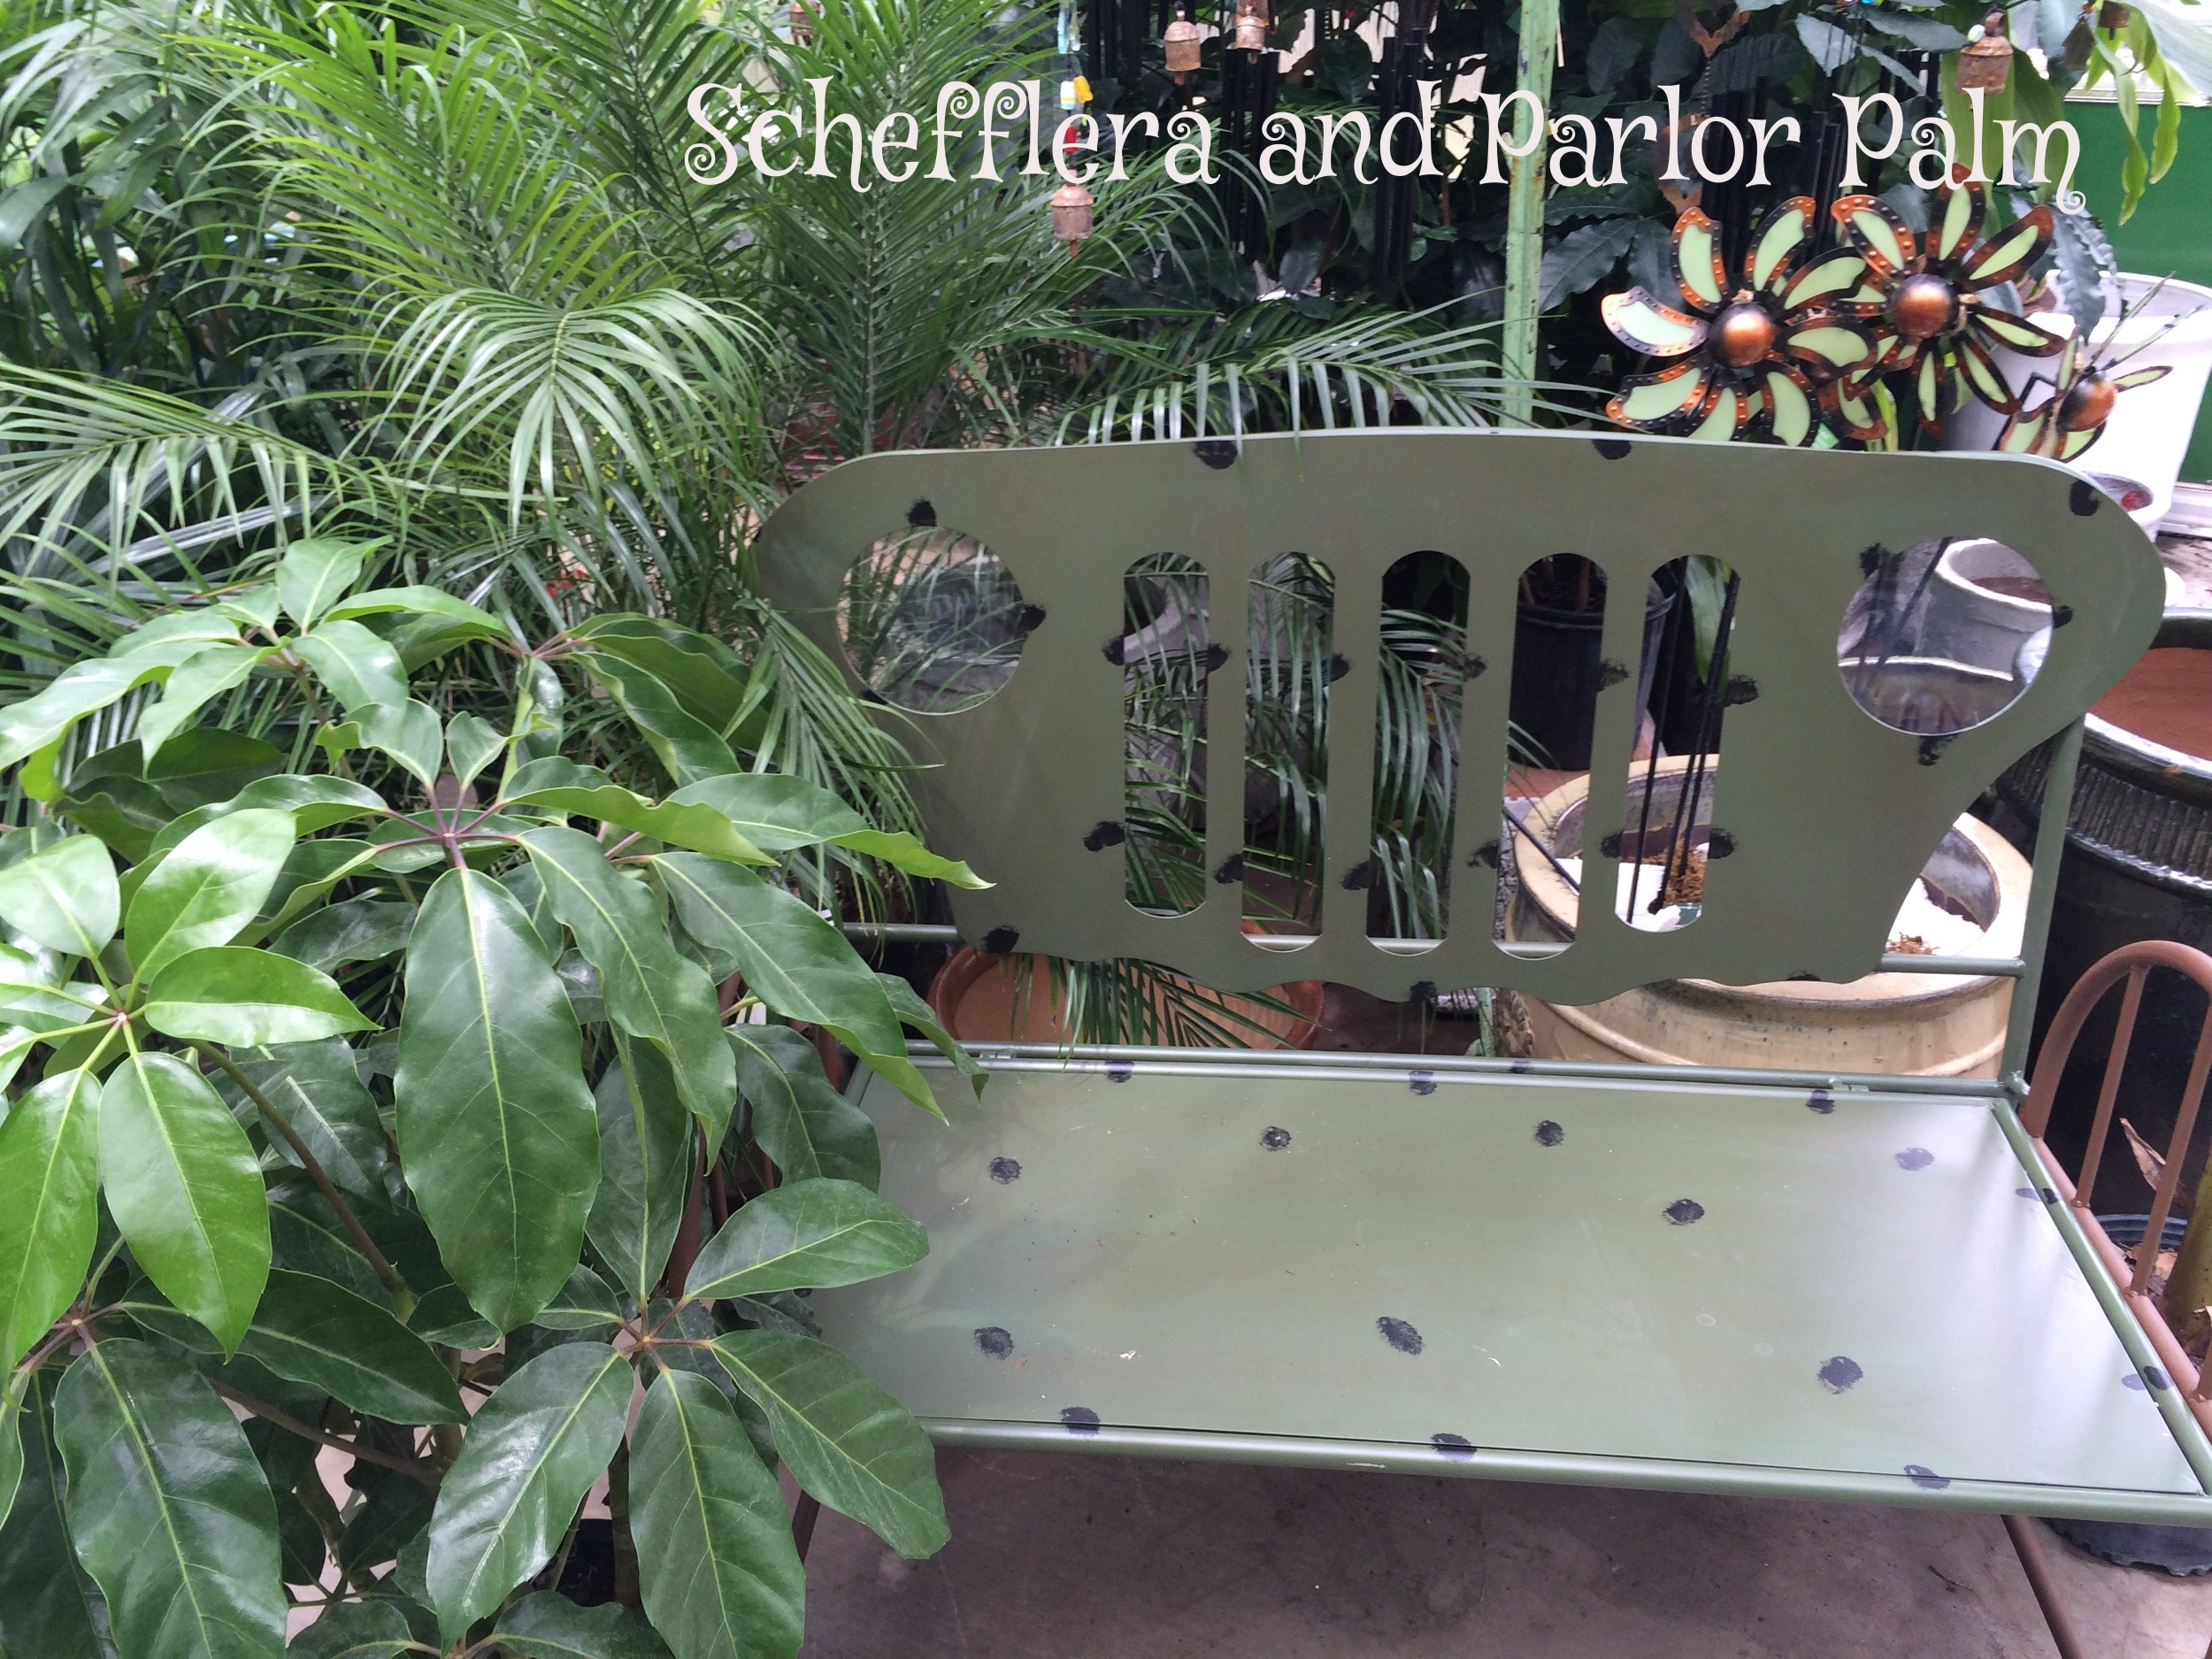 Parlor Palm and Schefflera